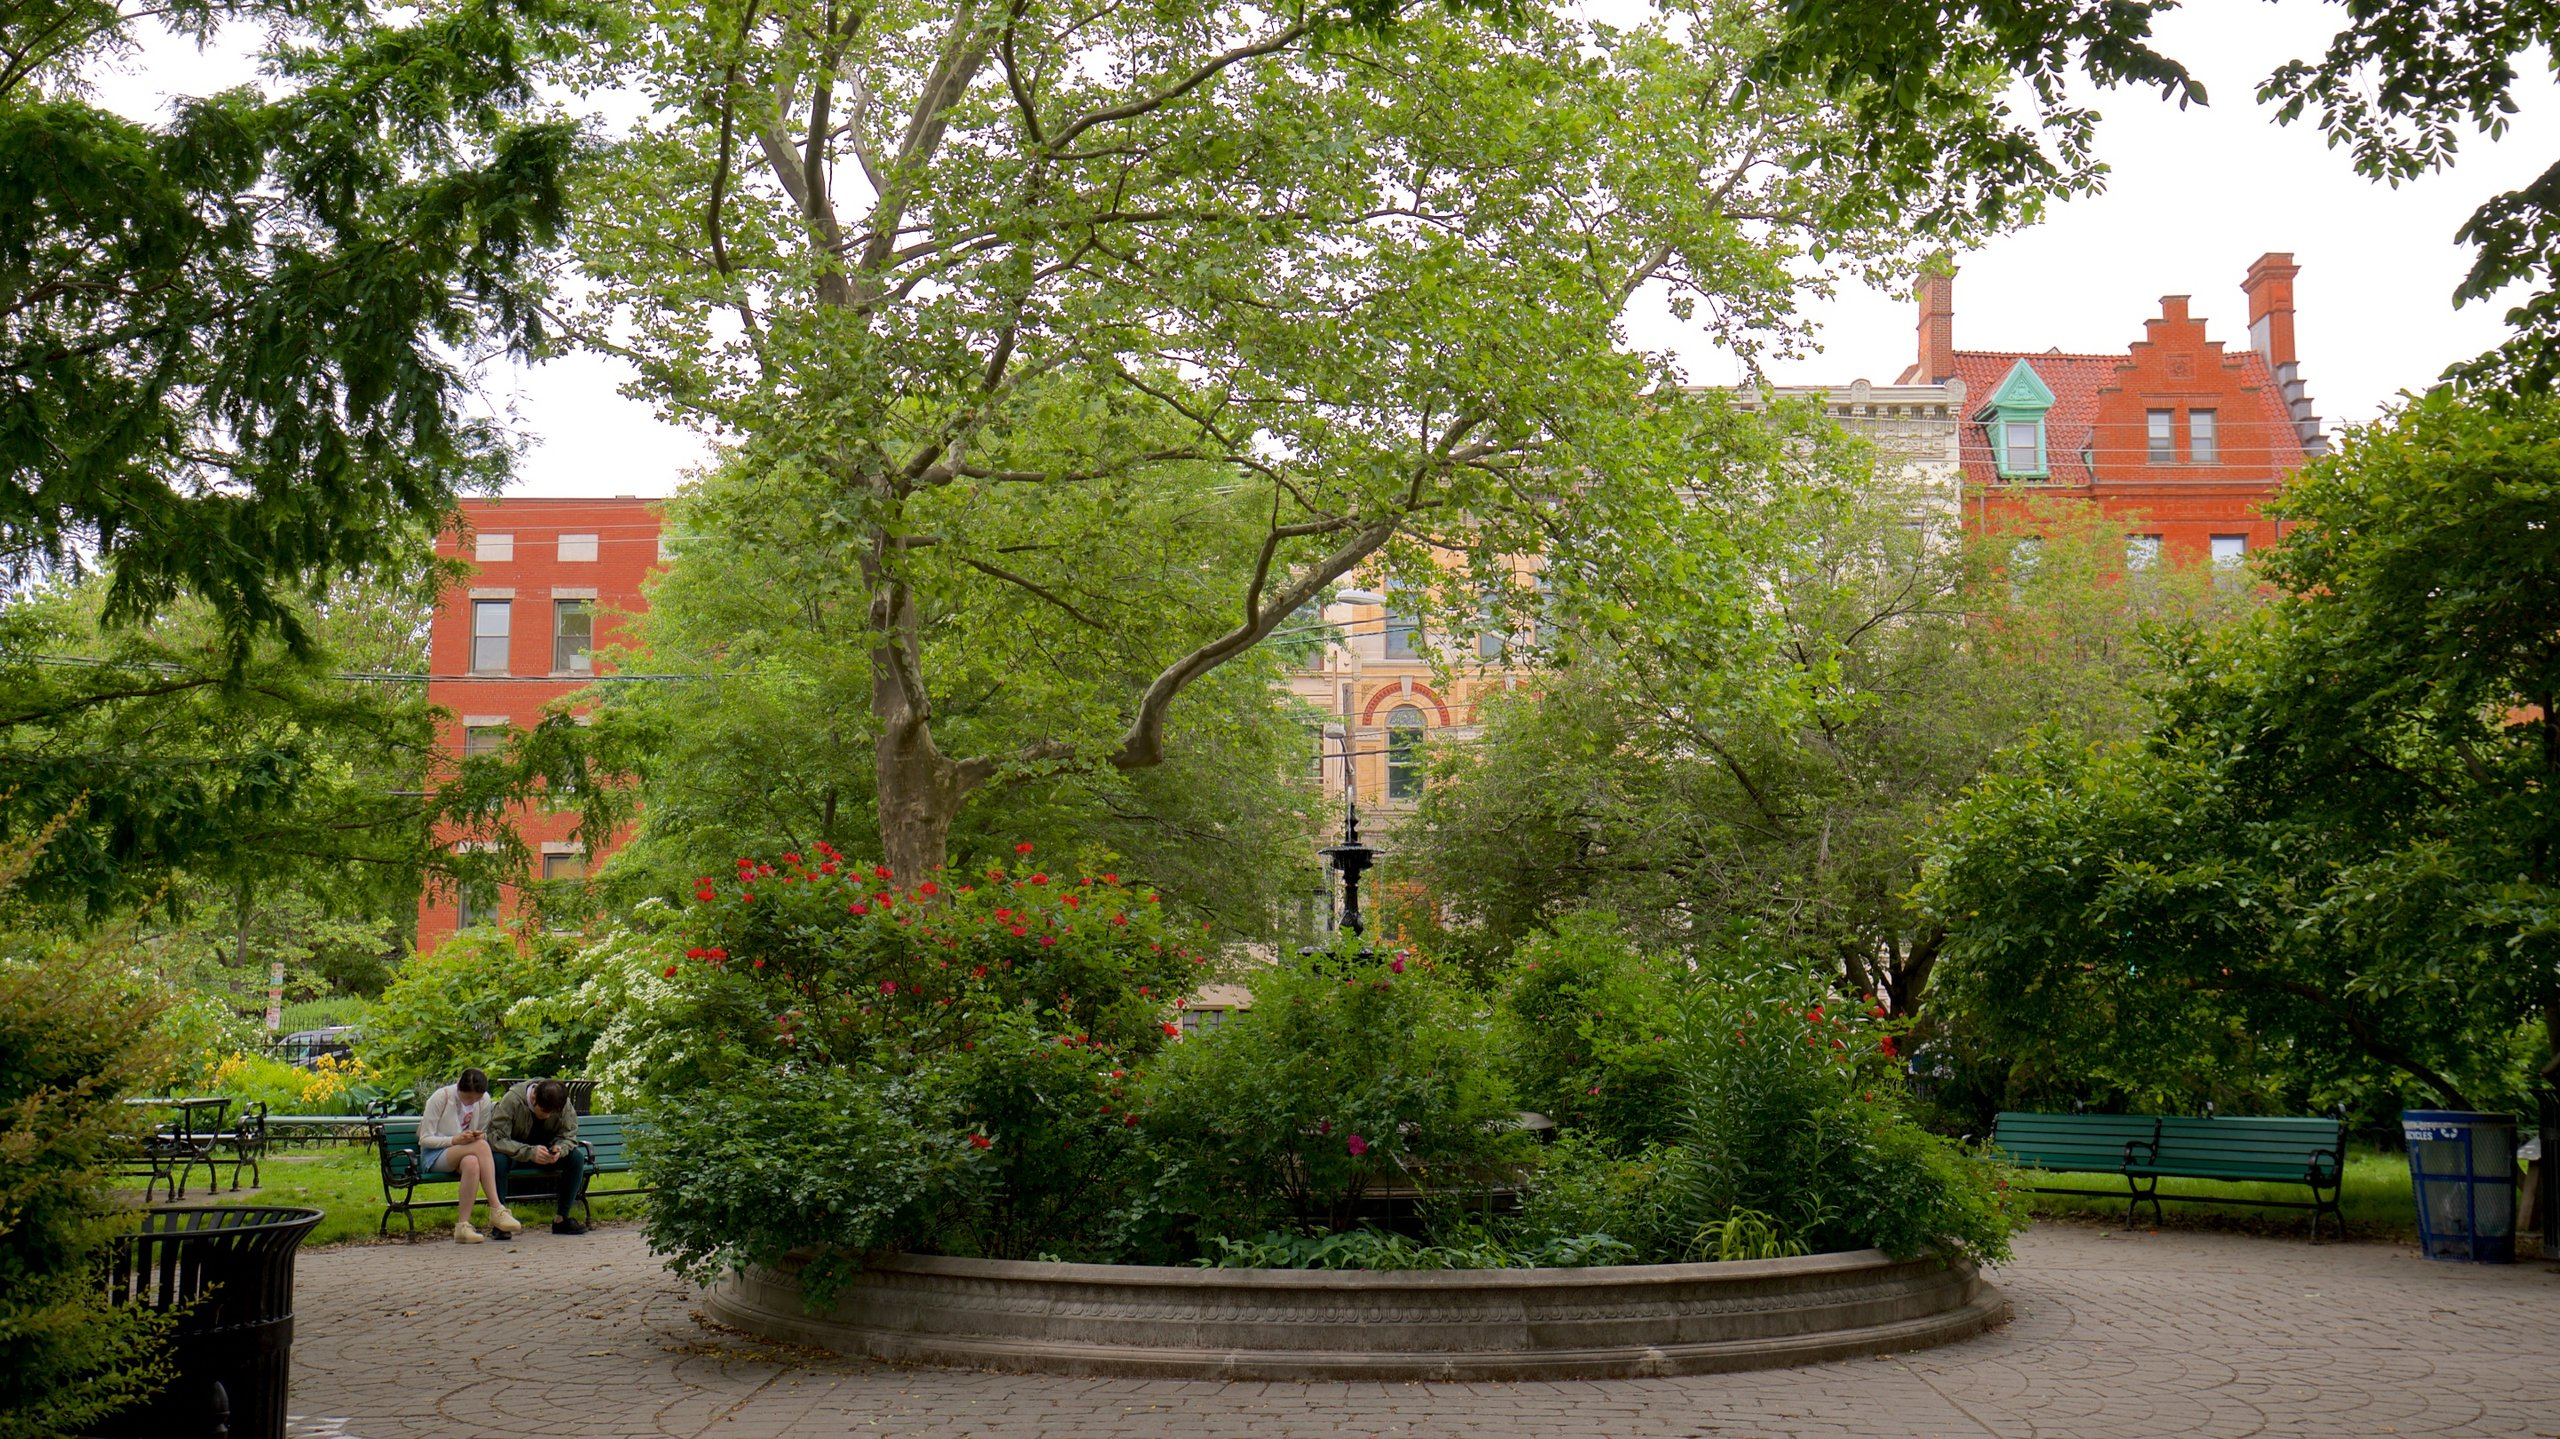 Van Vorst Park, Jersey City, Hudson County, New Jersey, United States of America